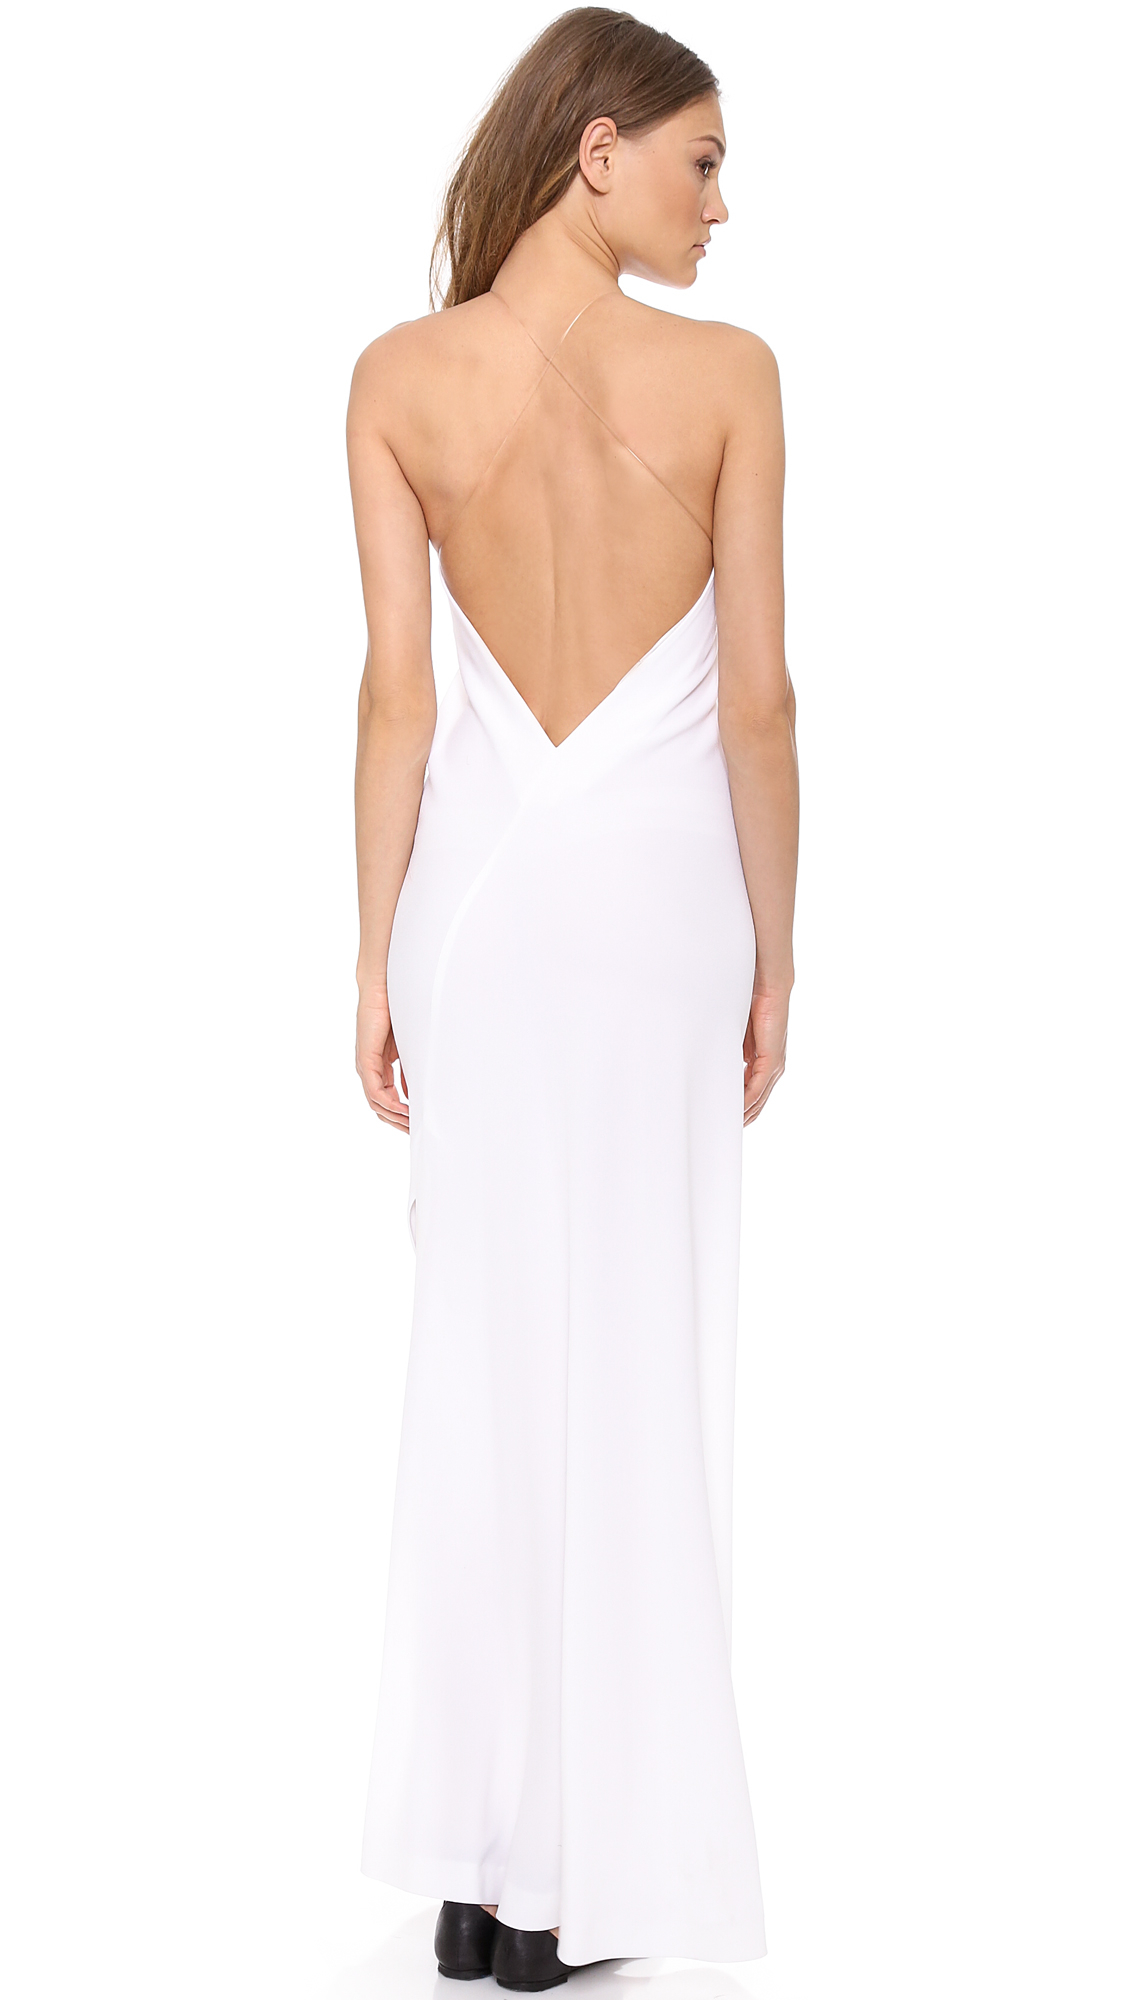 Dkny Illusion Maxi Dress White in White  Lyst